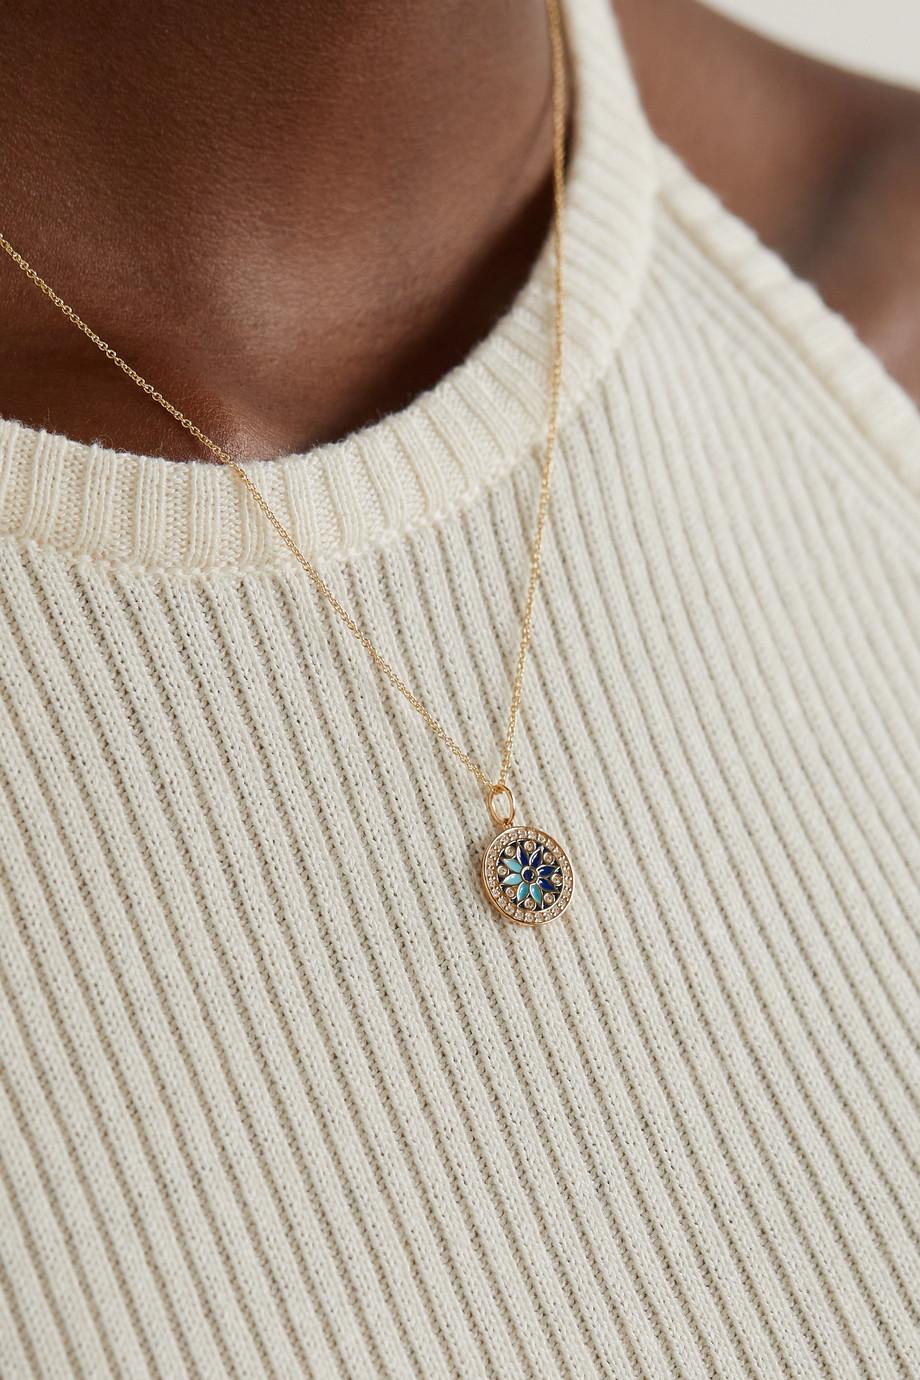 Sydney Evan Small 14-karat gold, enamel, diamond and sapphire necklace